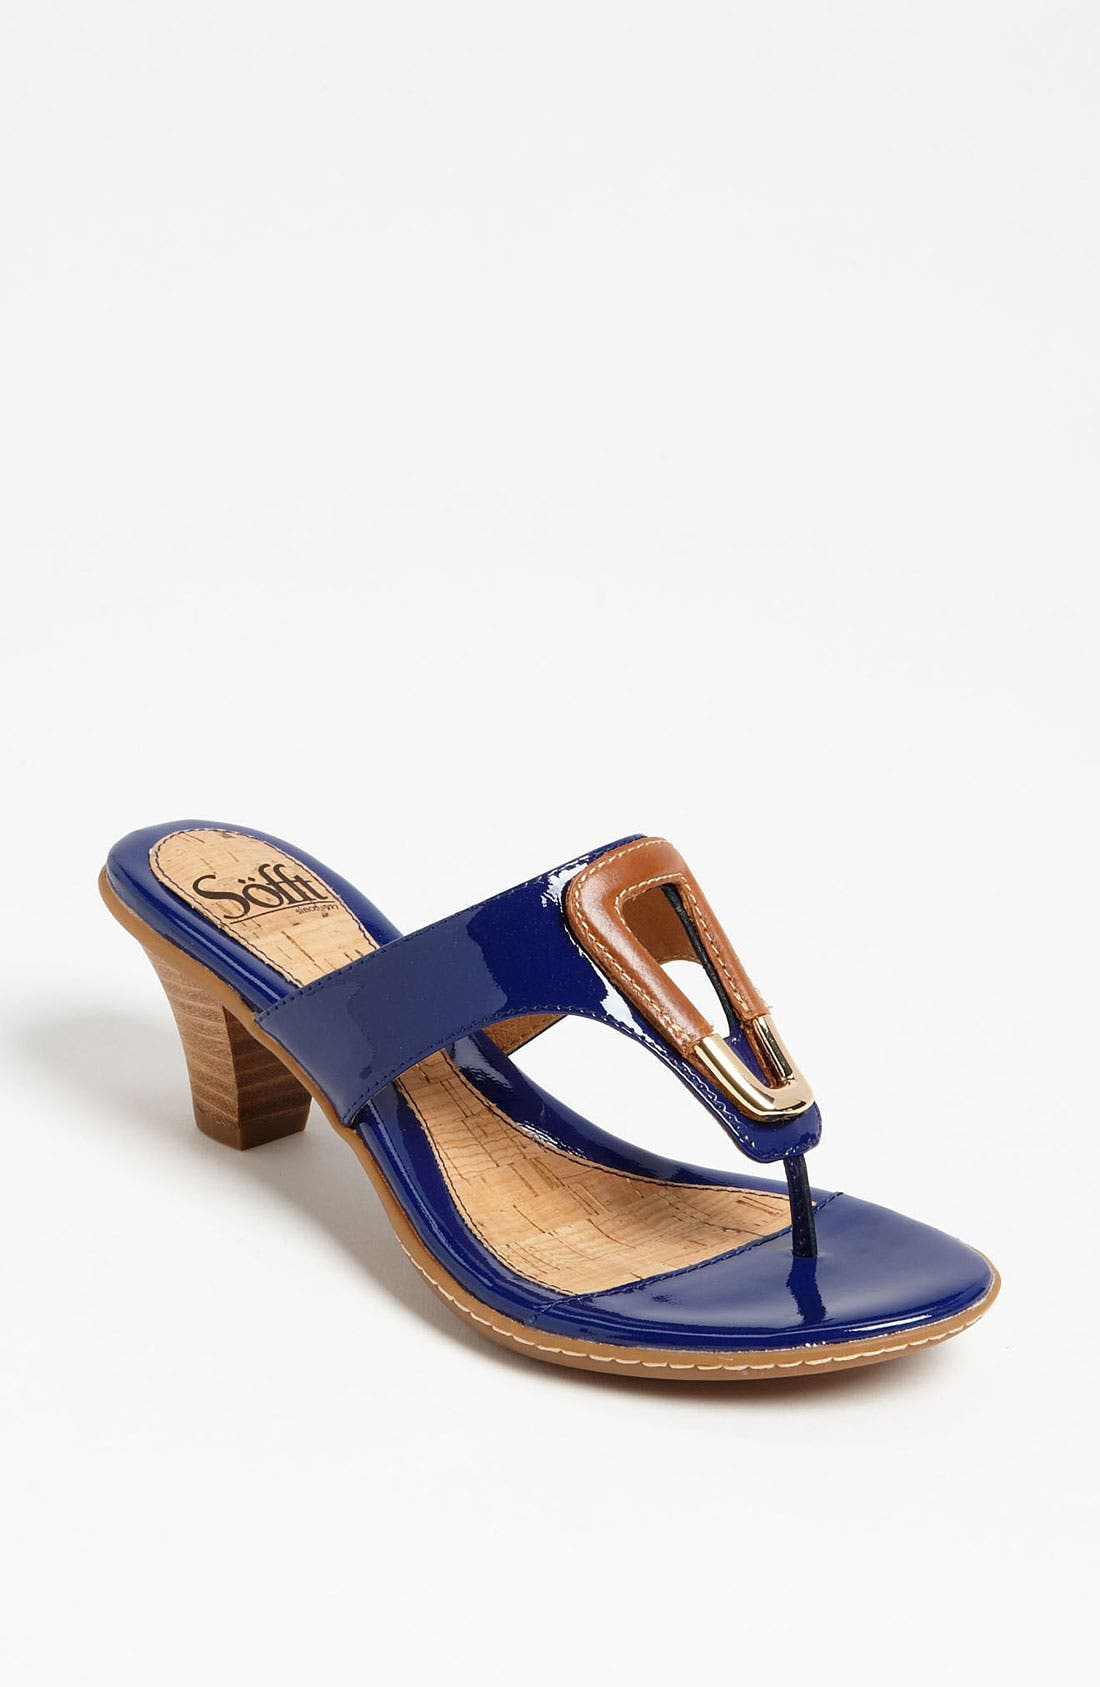 Alternate Image 1 Selected - Söfft 'Raphaella' Sandal